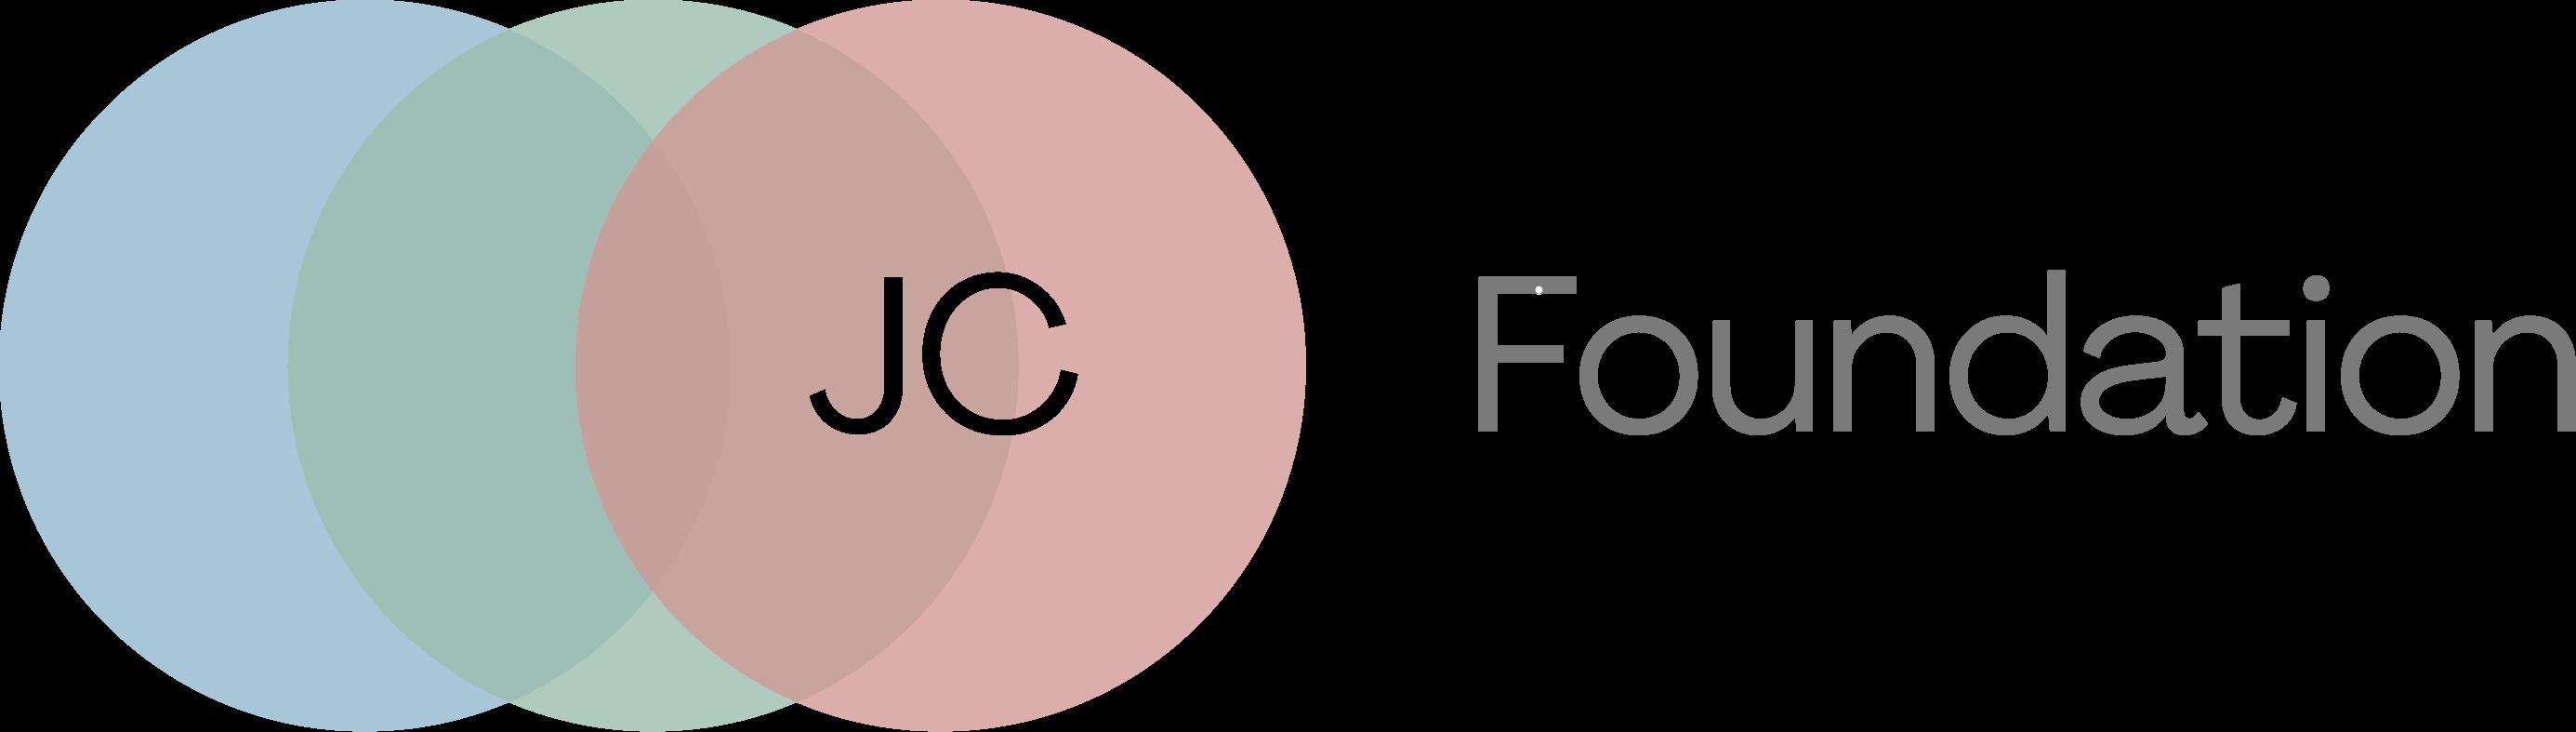 JC Foundation